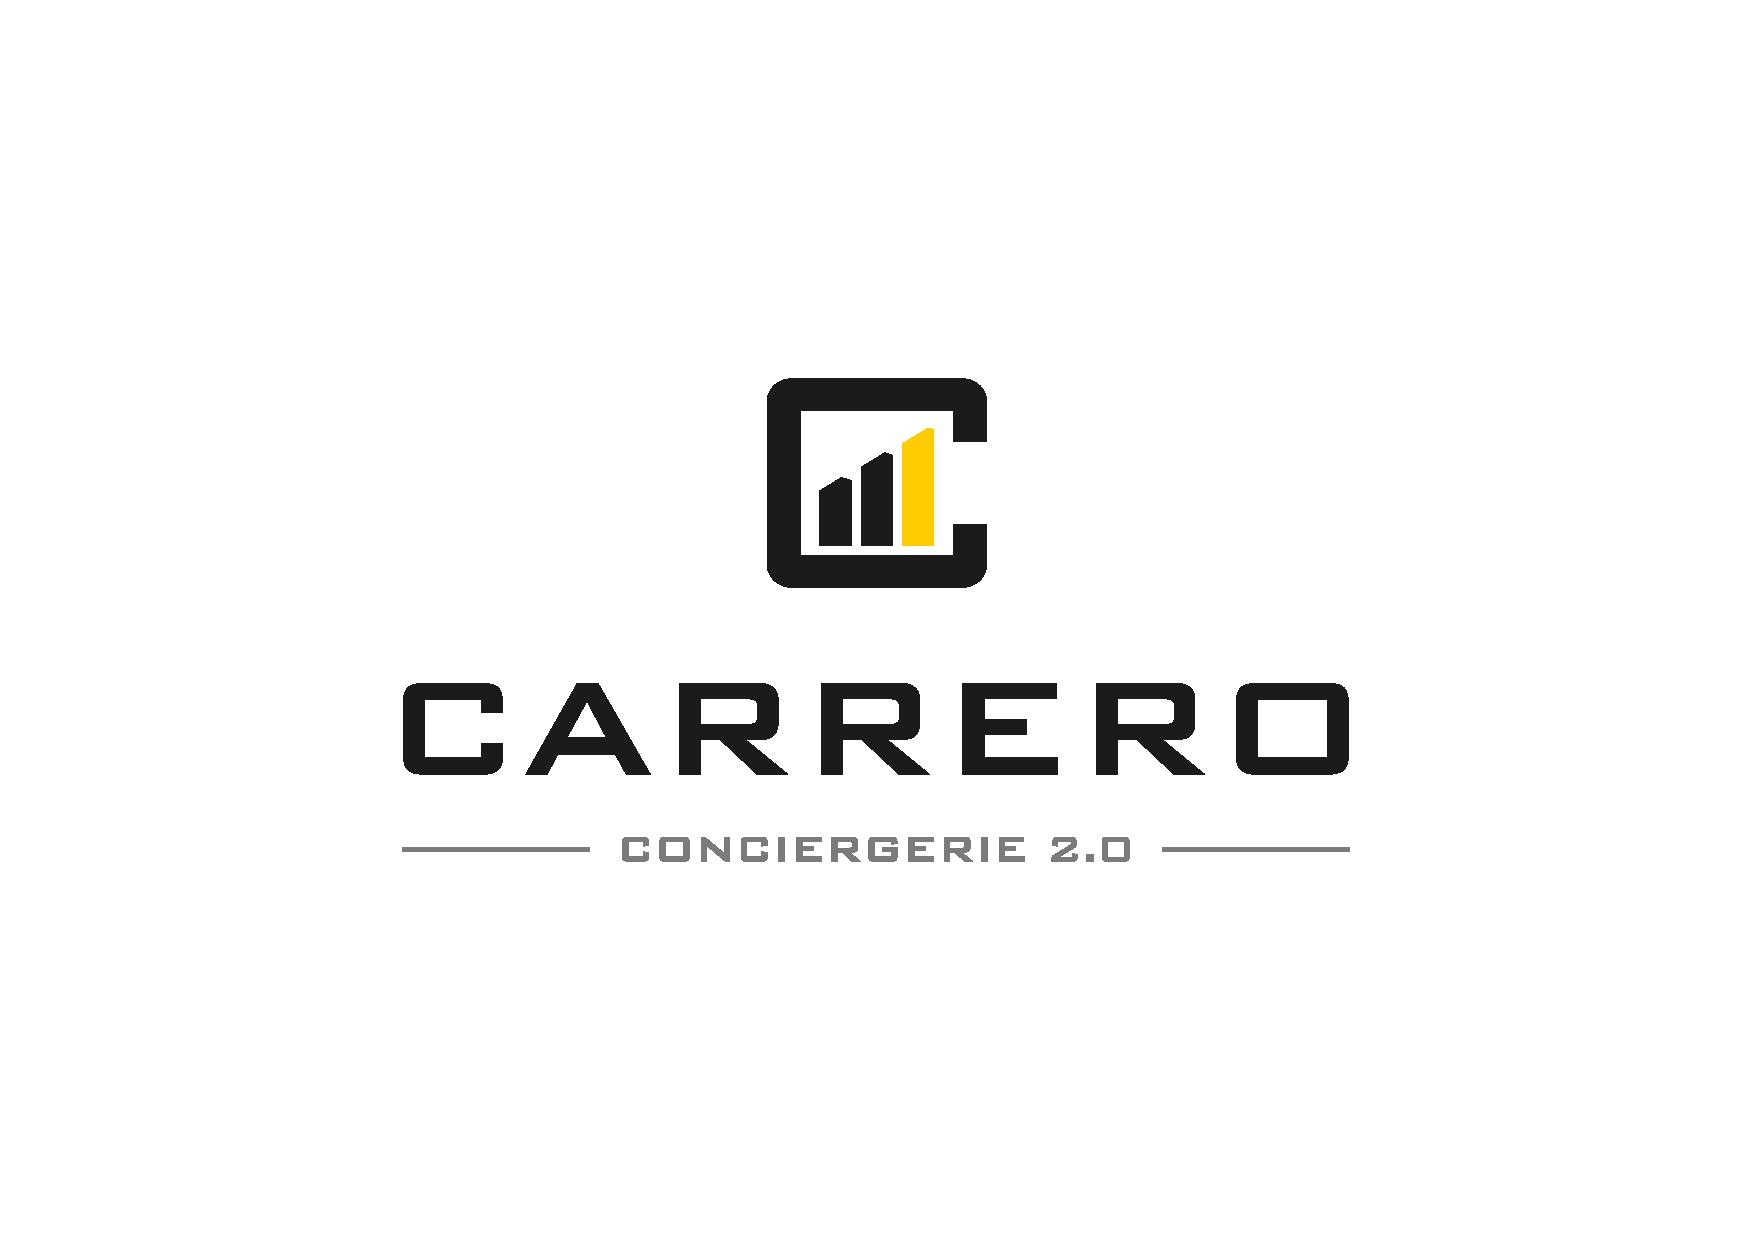 Logo de Carrero Conciergerie 2.0